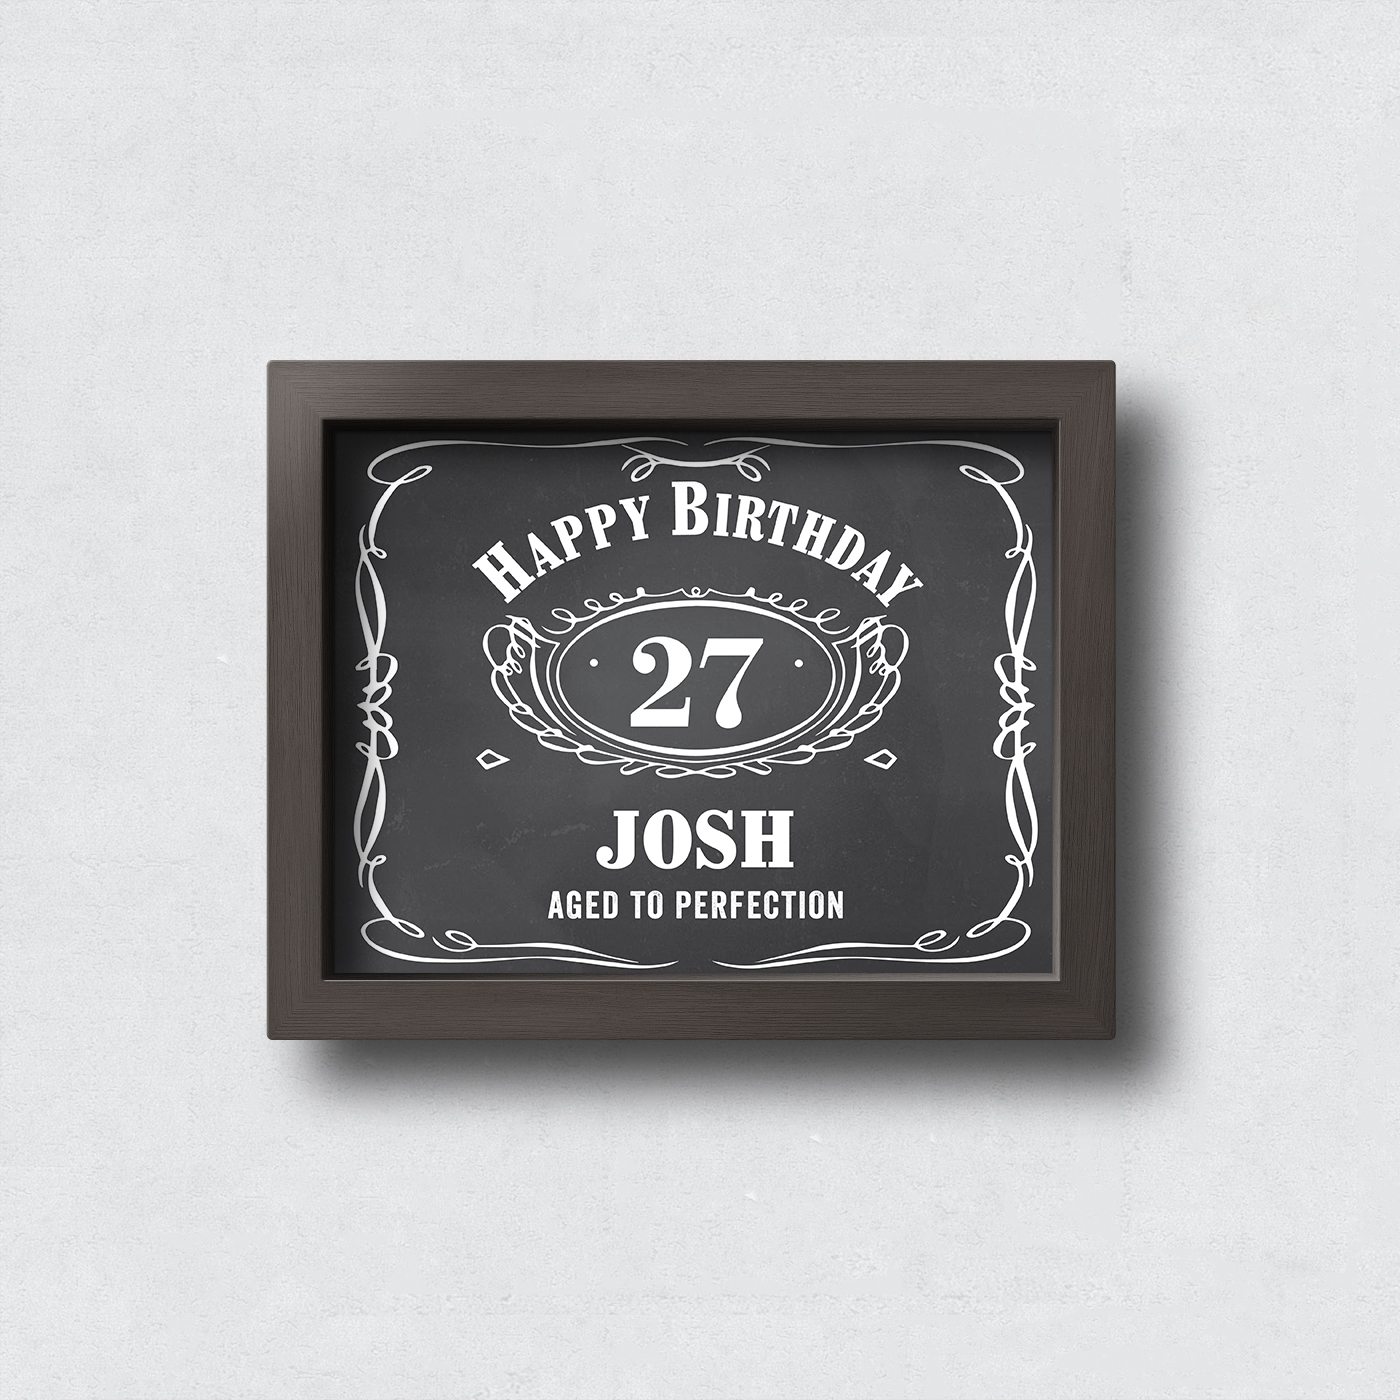 Happy Birthday Sign for Man.jpg